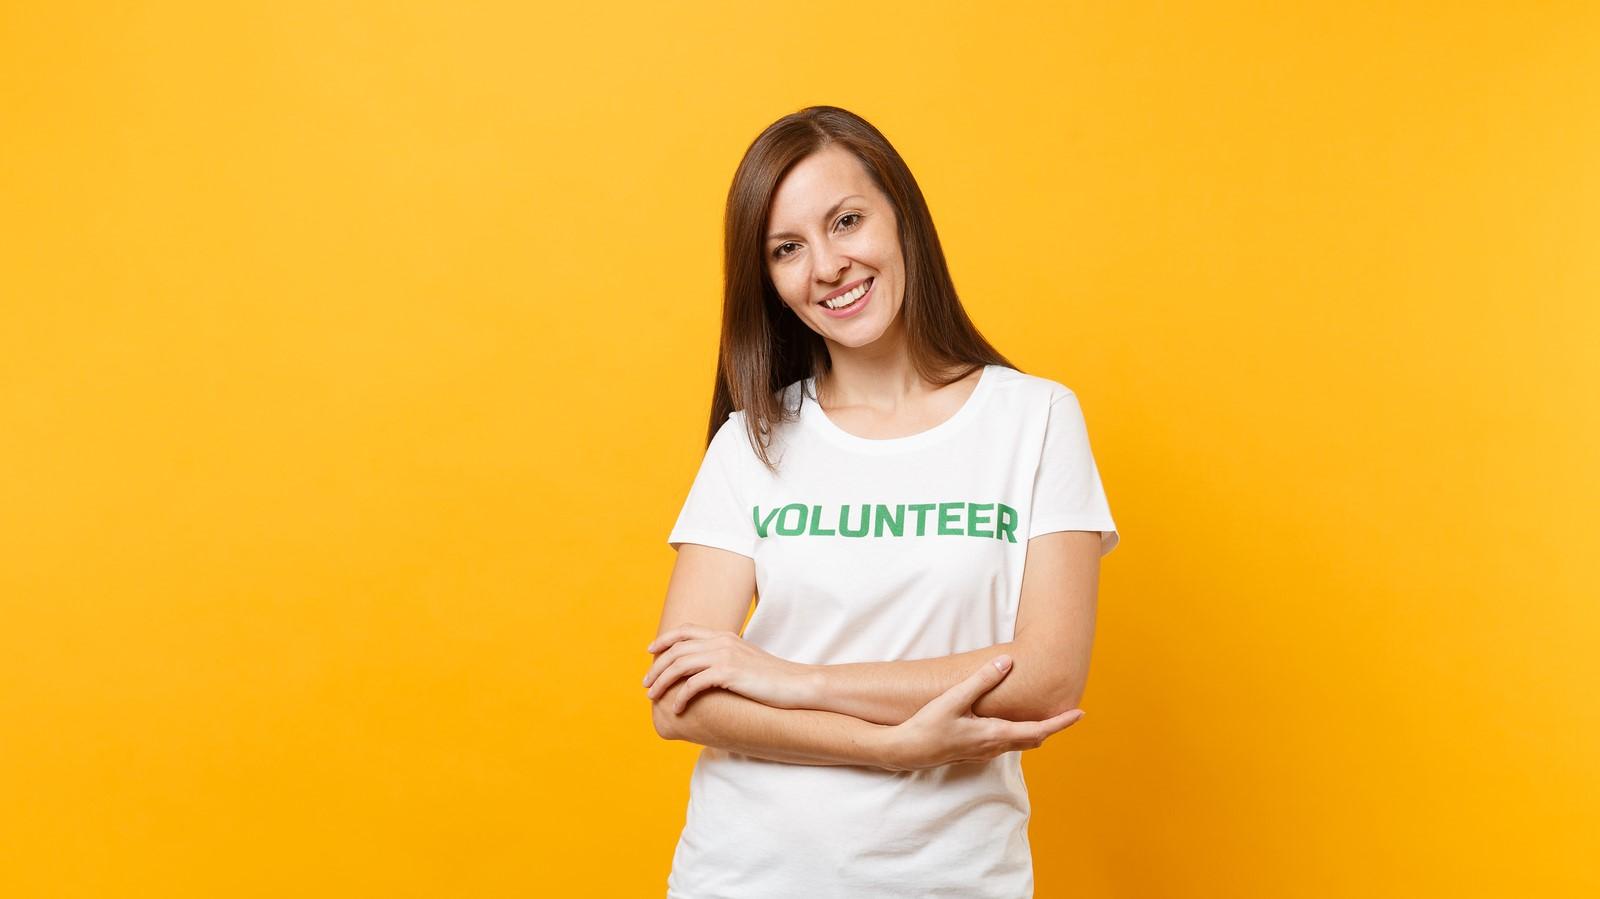 bigstock-Portrait-Of-Happy-Smiling-Sati-273117721